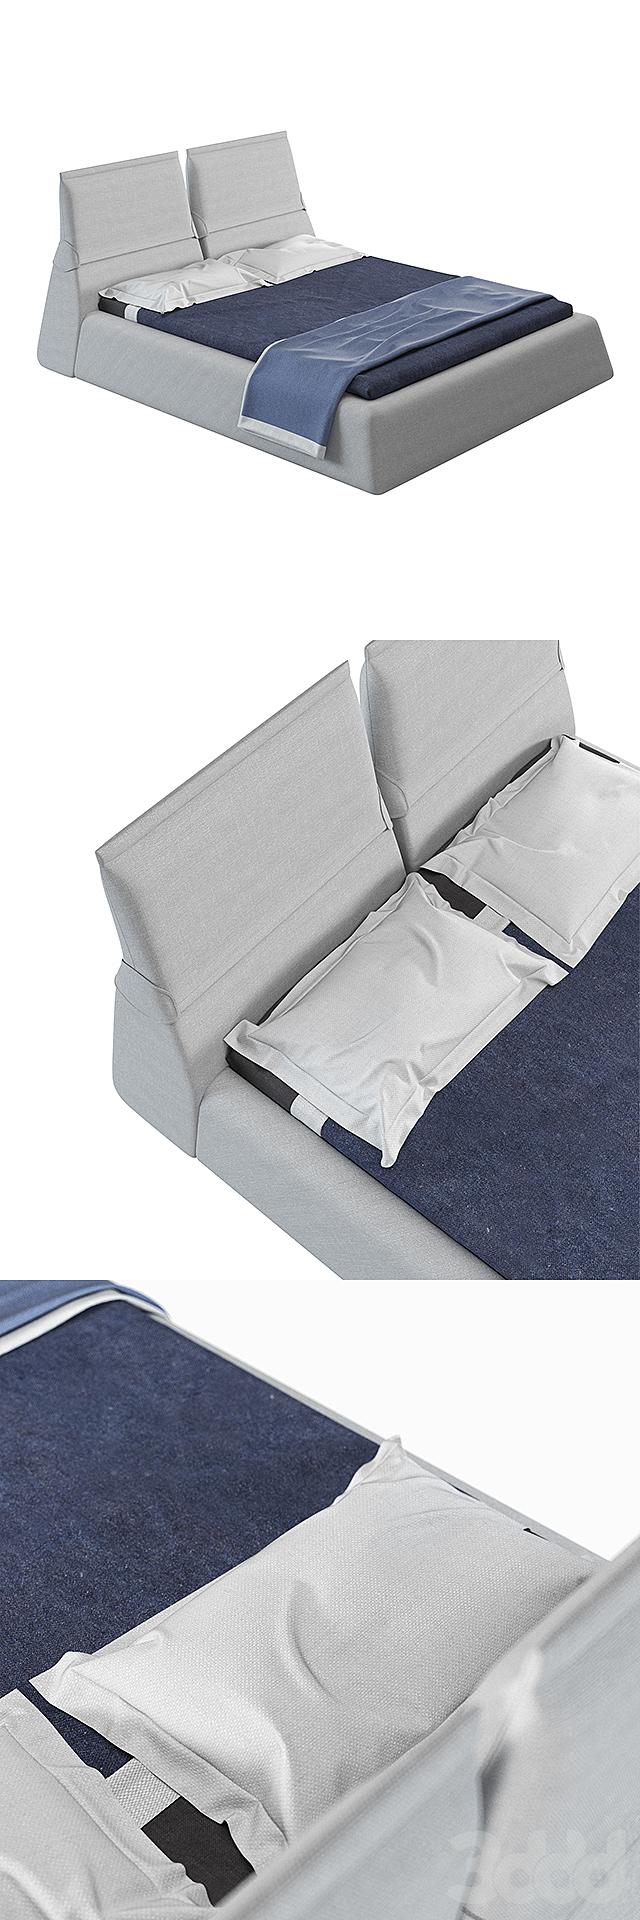 MOROSO Highland Bed